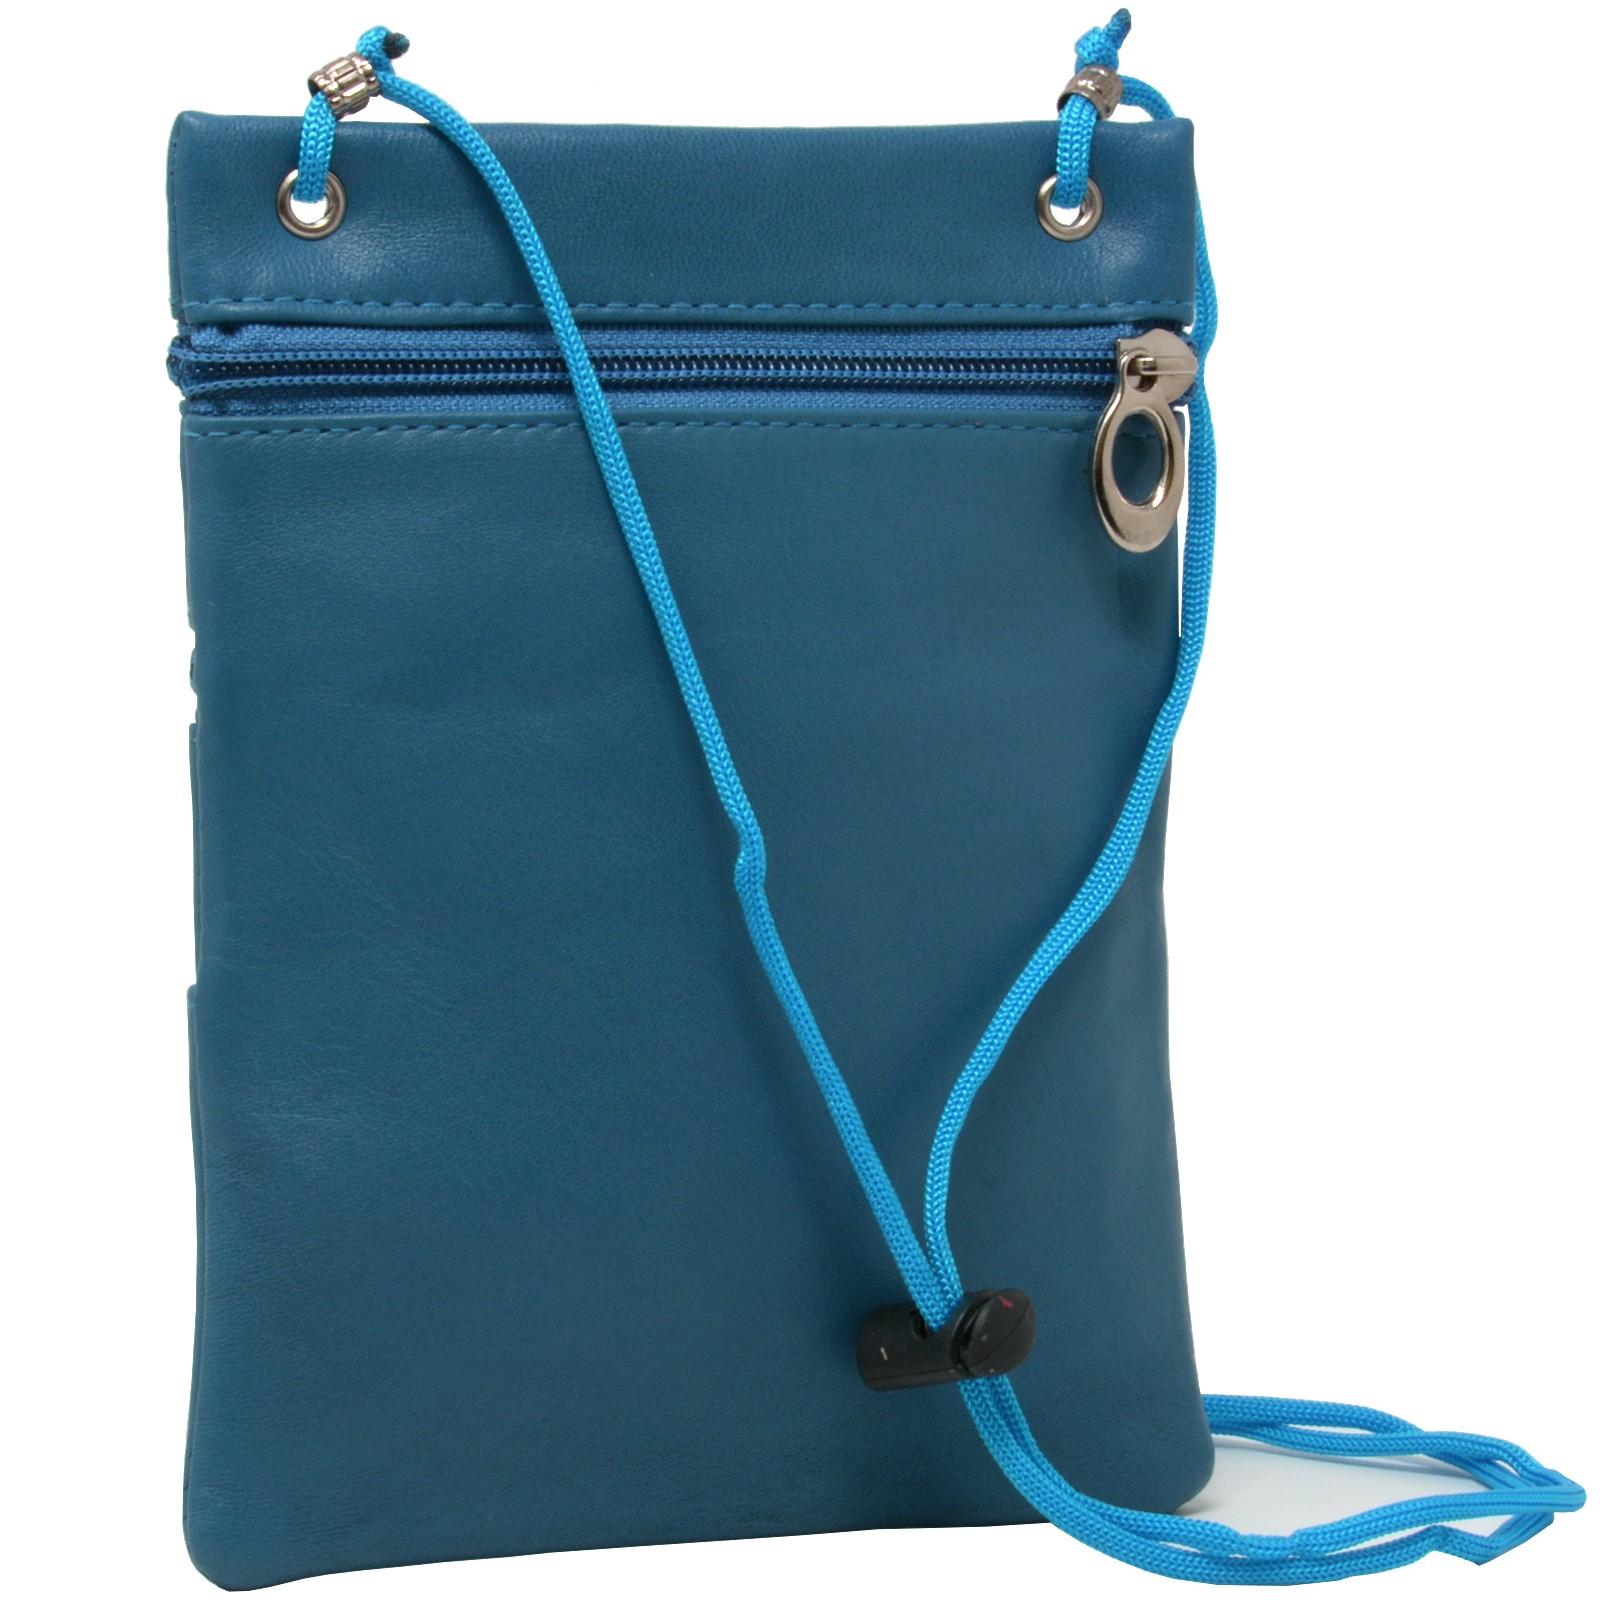 Soft-Leather-Purse-Organizer-Shoulder-Bag-4-Pocket-Micro-Handbag-Travel-Wallet thumbnail 23